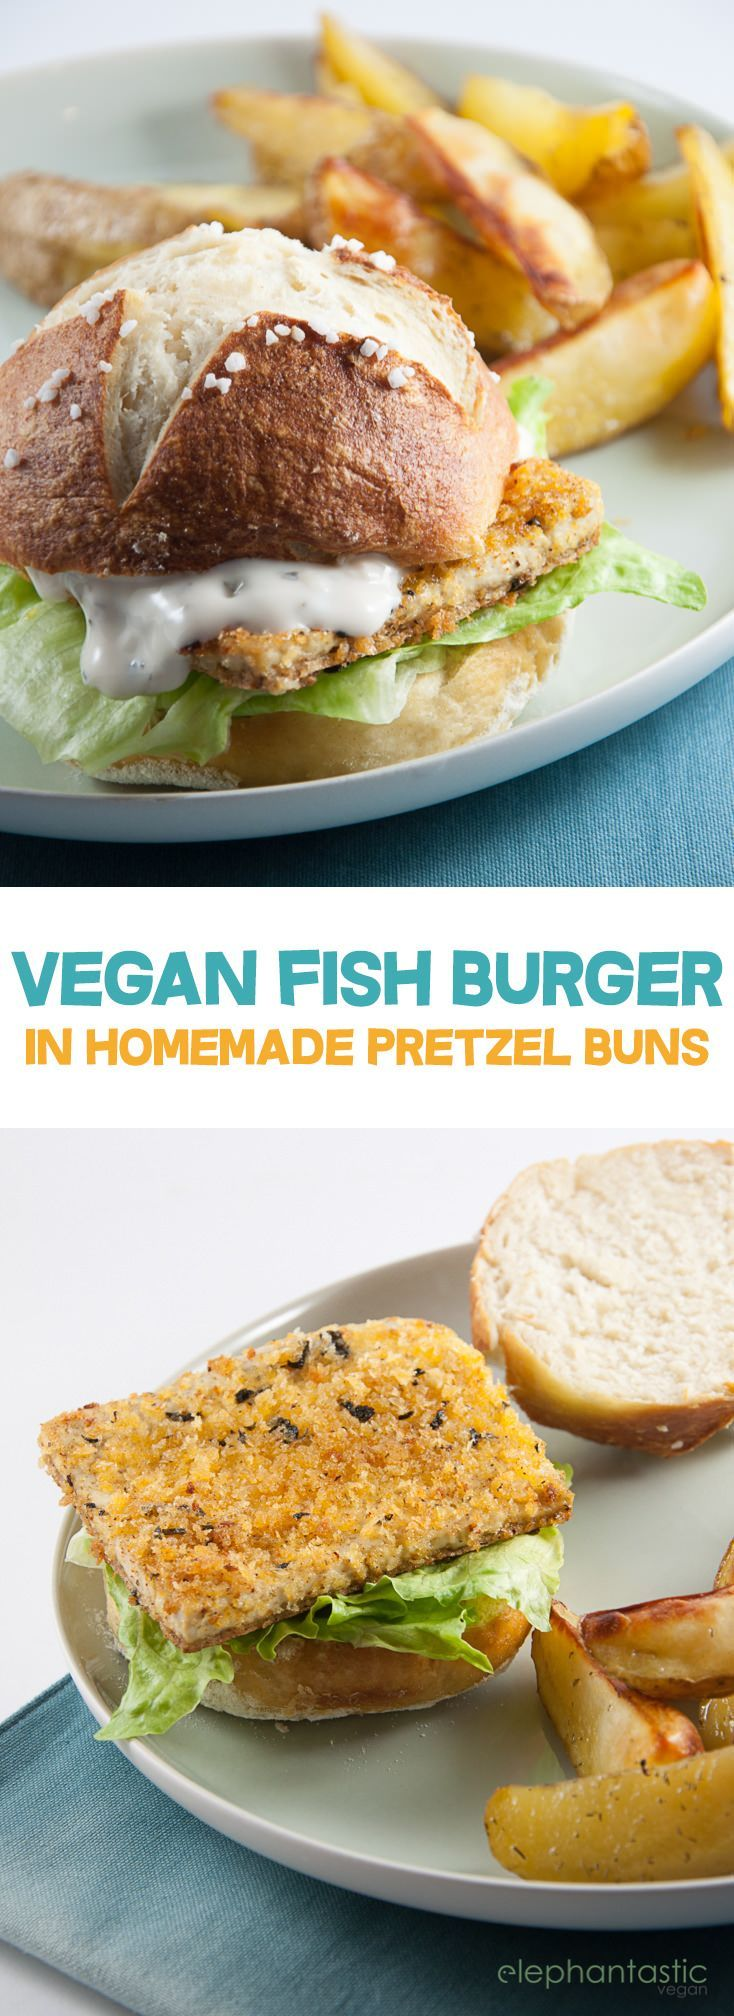 Vegan fish burger with homemade pretzel rolls recipe for Fish burger recipe